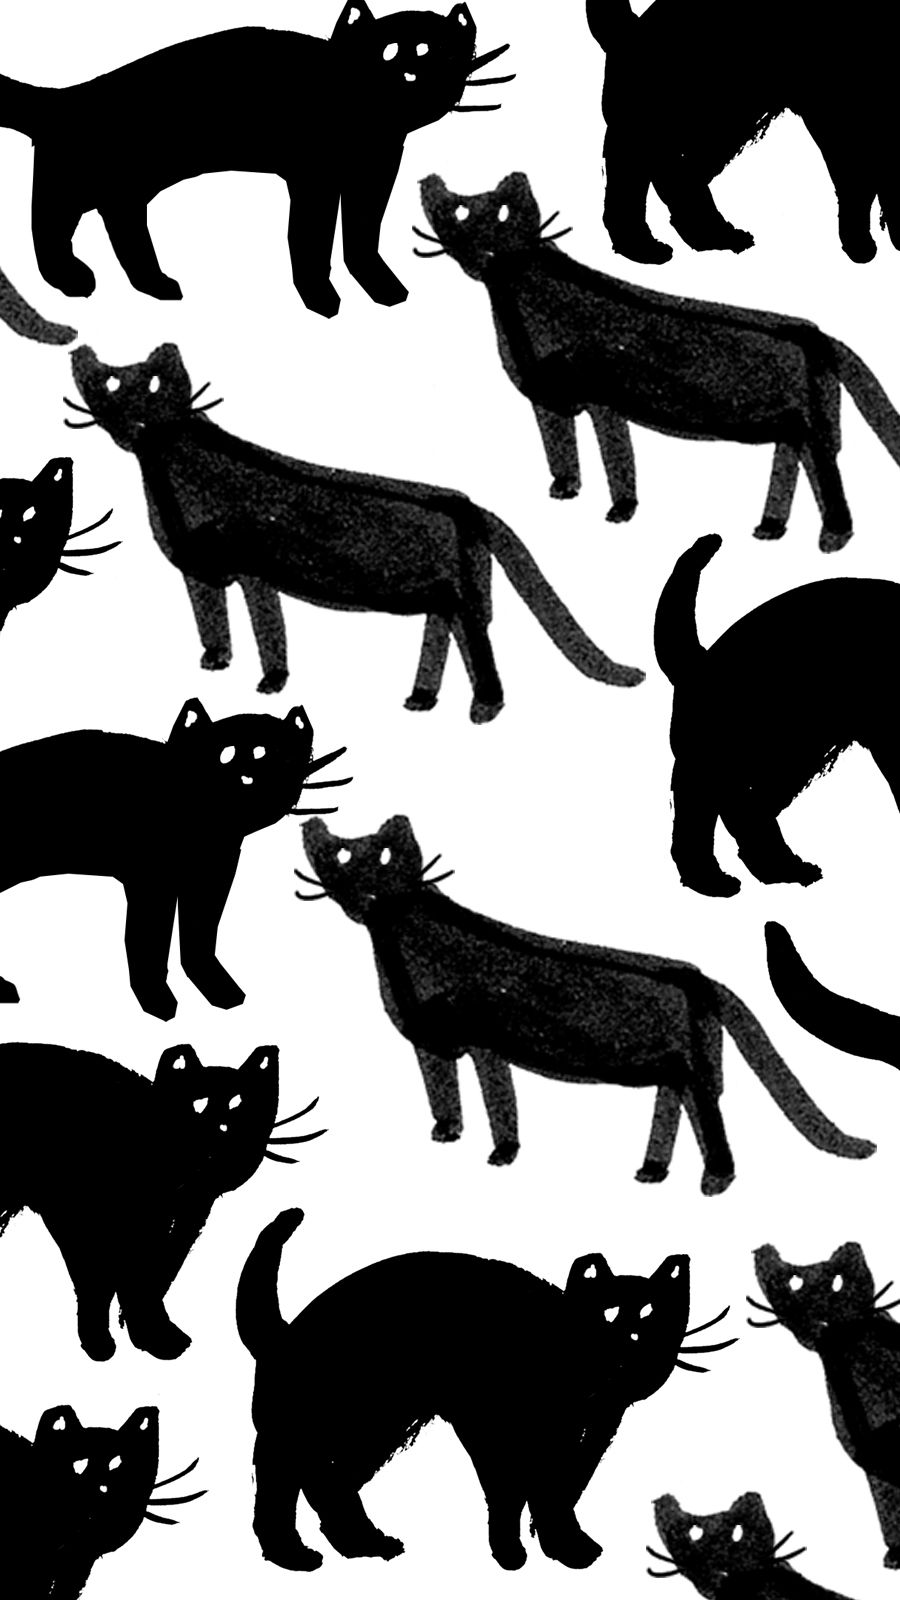 Animal iphone wallpaper tumblr - Wallpaper Source Dressupyourtech Iphone Wallpaper